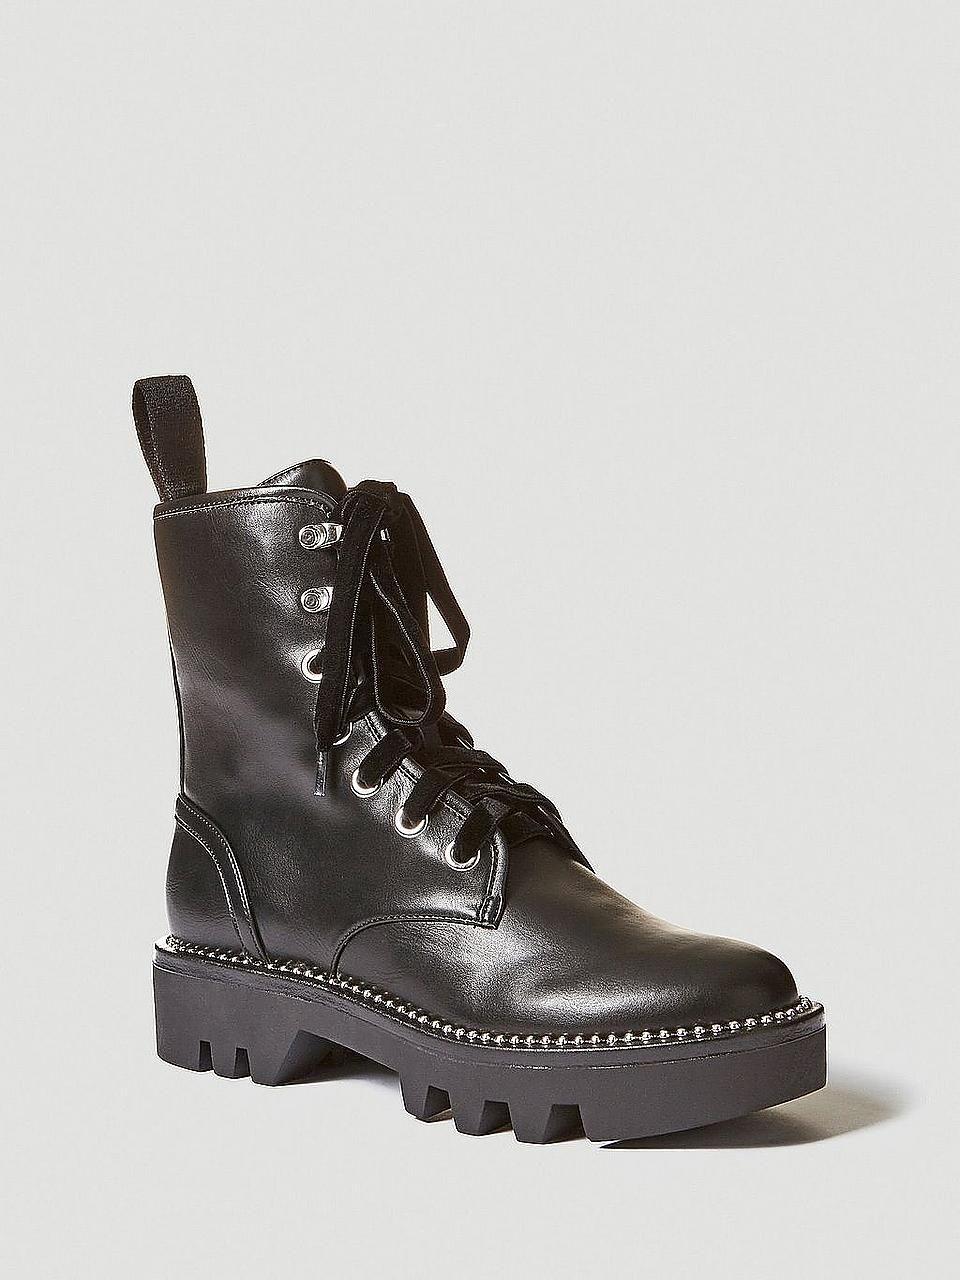 9603b48ca6868e Guess Stiefel  boots  stiefeletten  schuhe  damenschuhe  herbstschuhe   herbstboots  winterboots